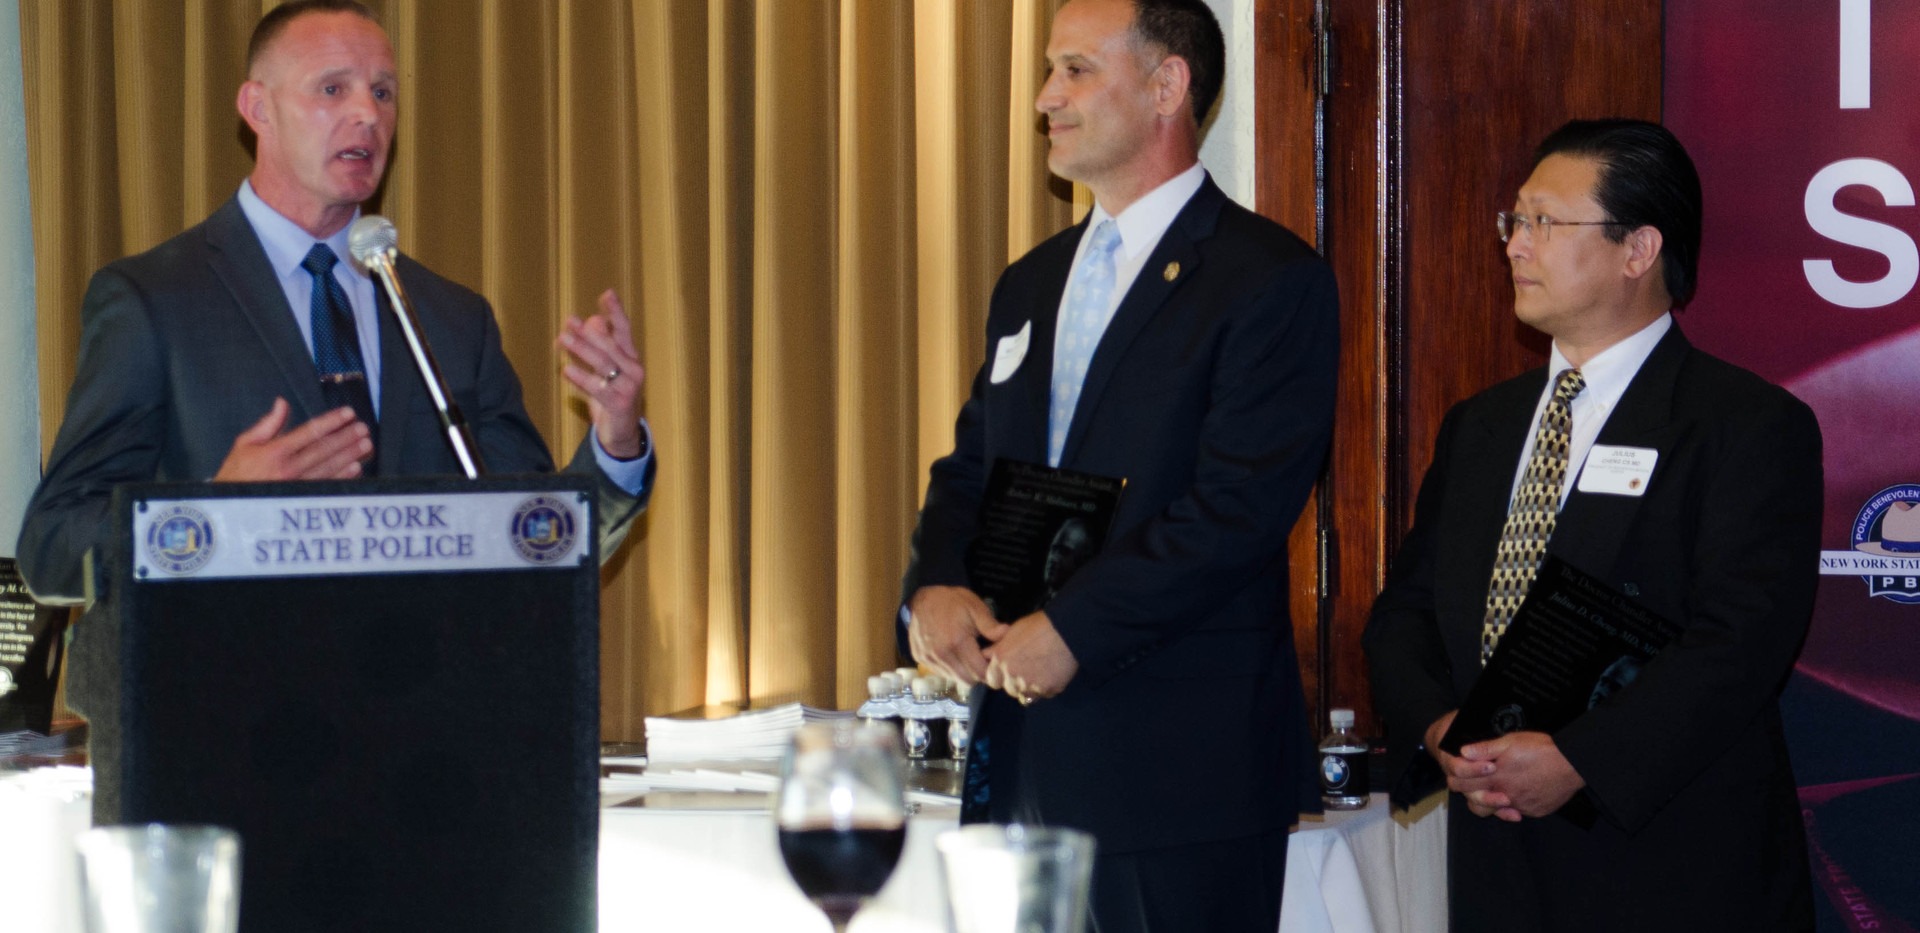 Buffalo Award Event